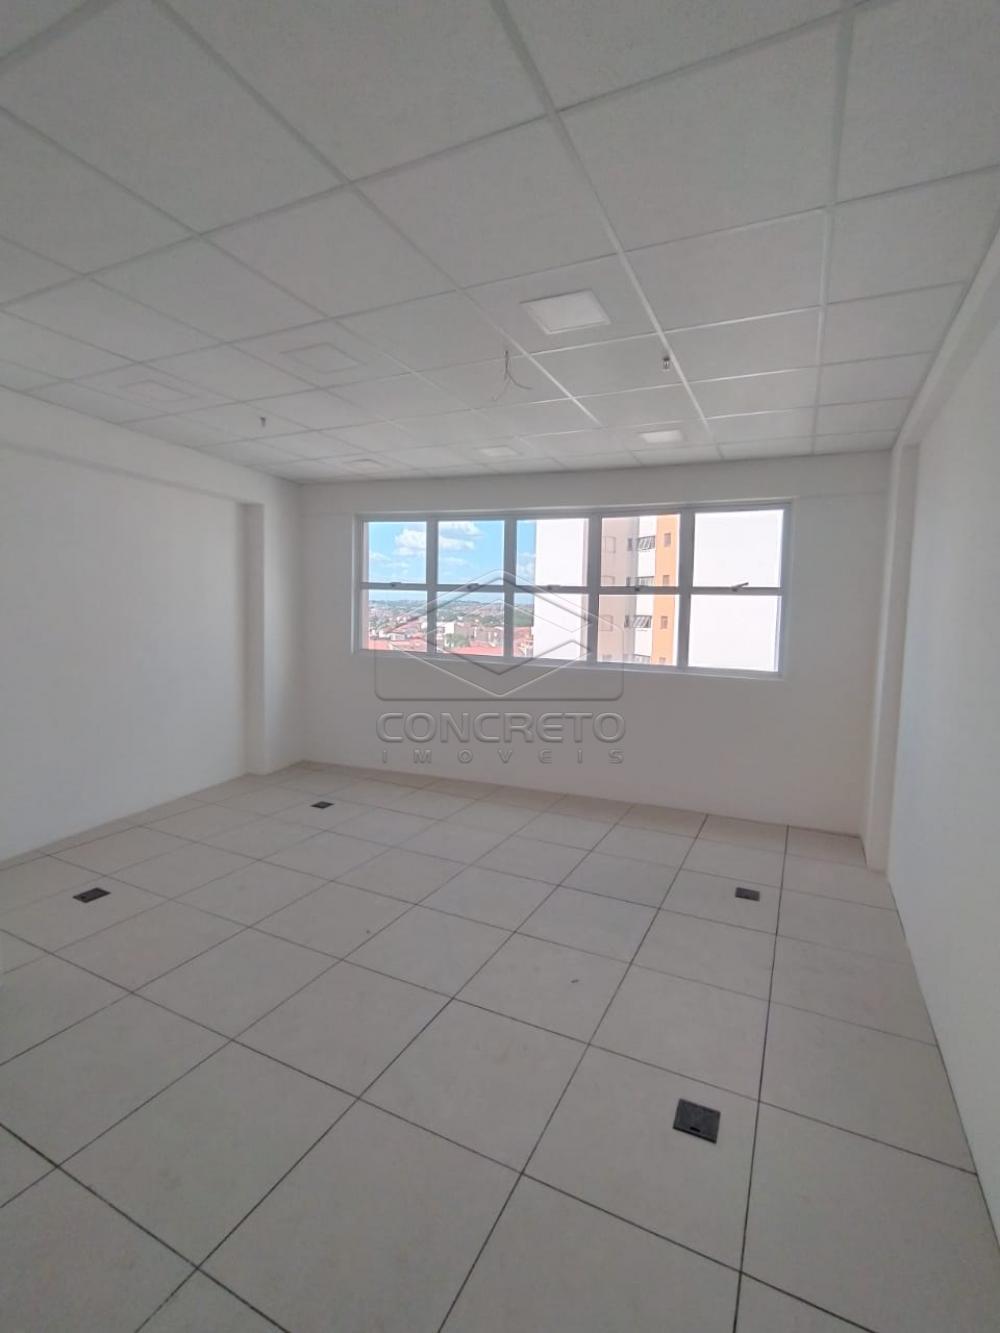 Alugar Comercial / Sala em Bauru apenas R$ 1.300,00 - Foto 7